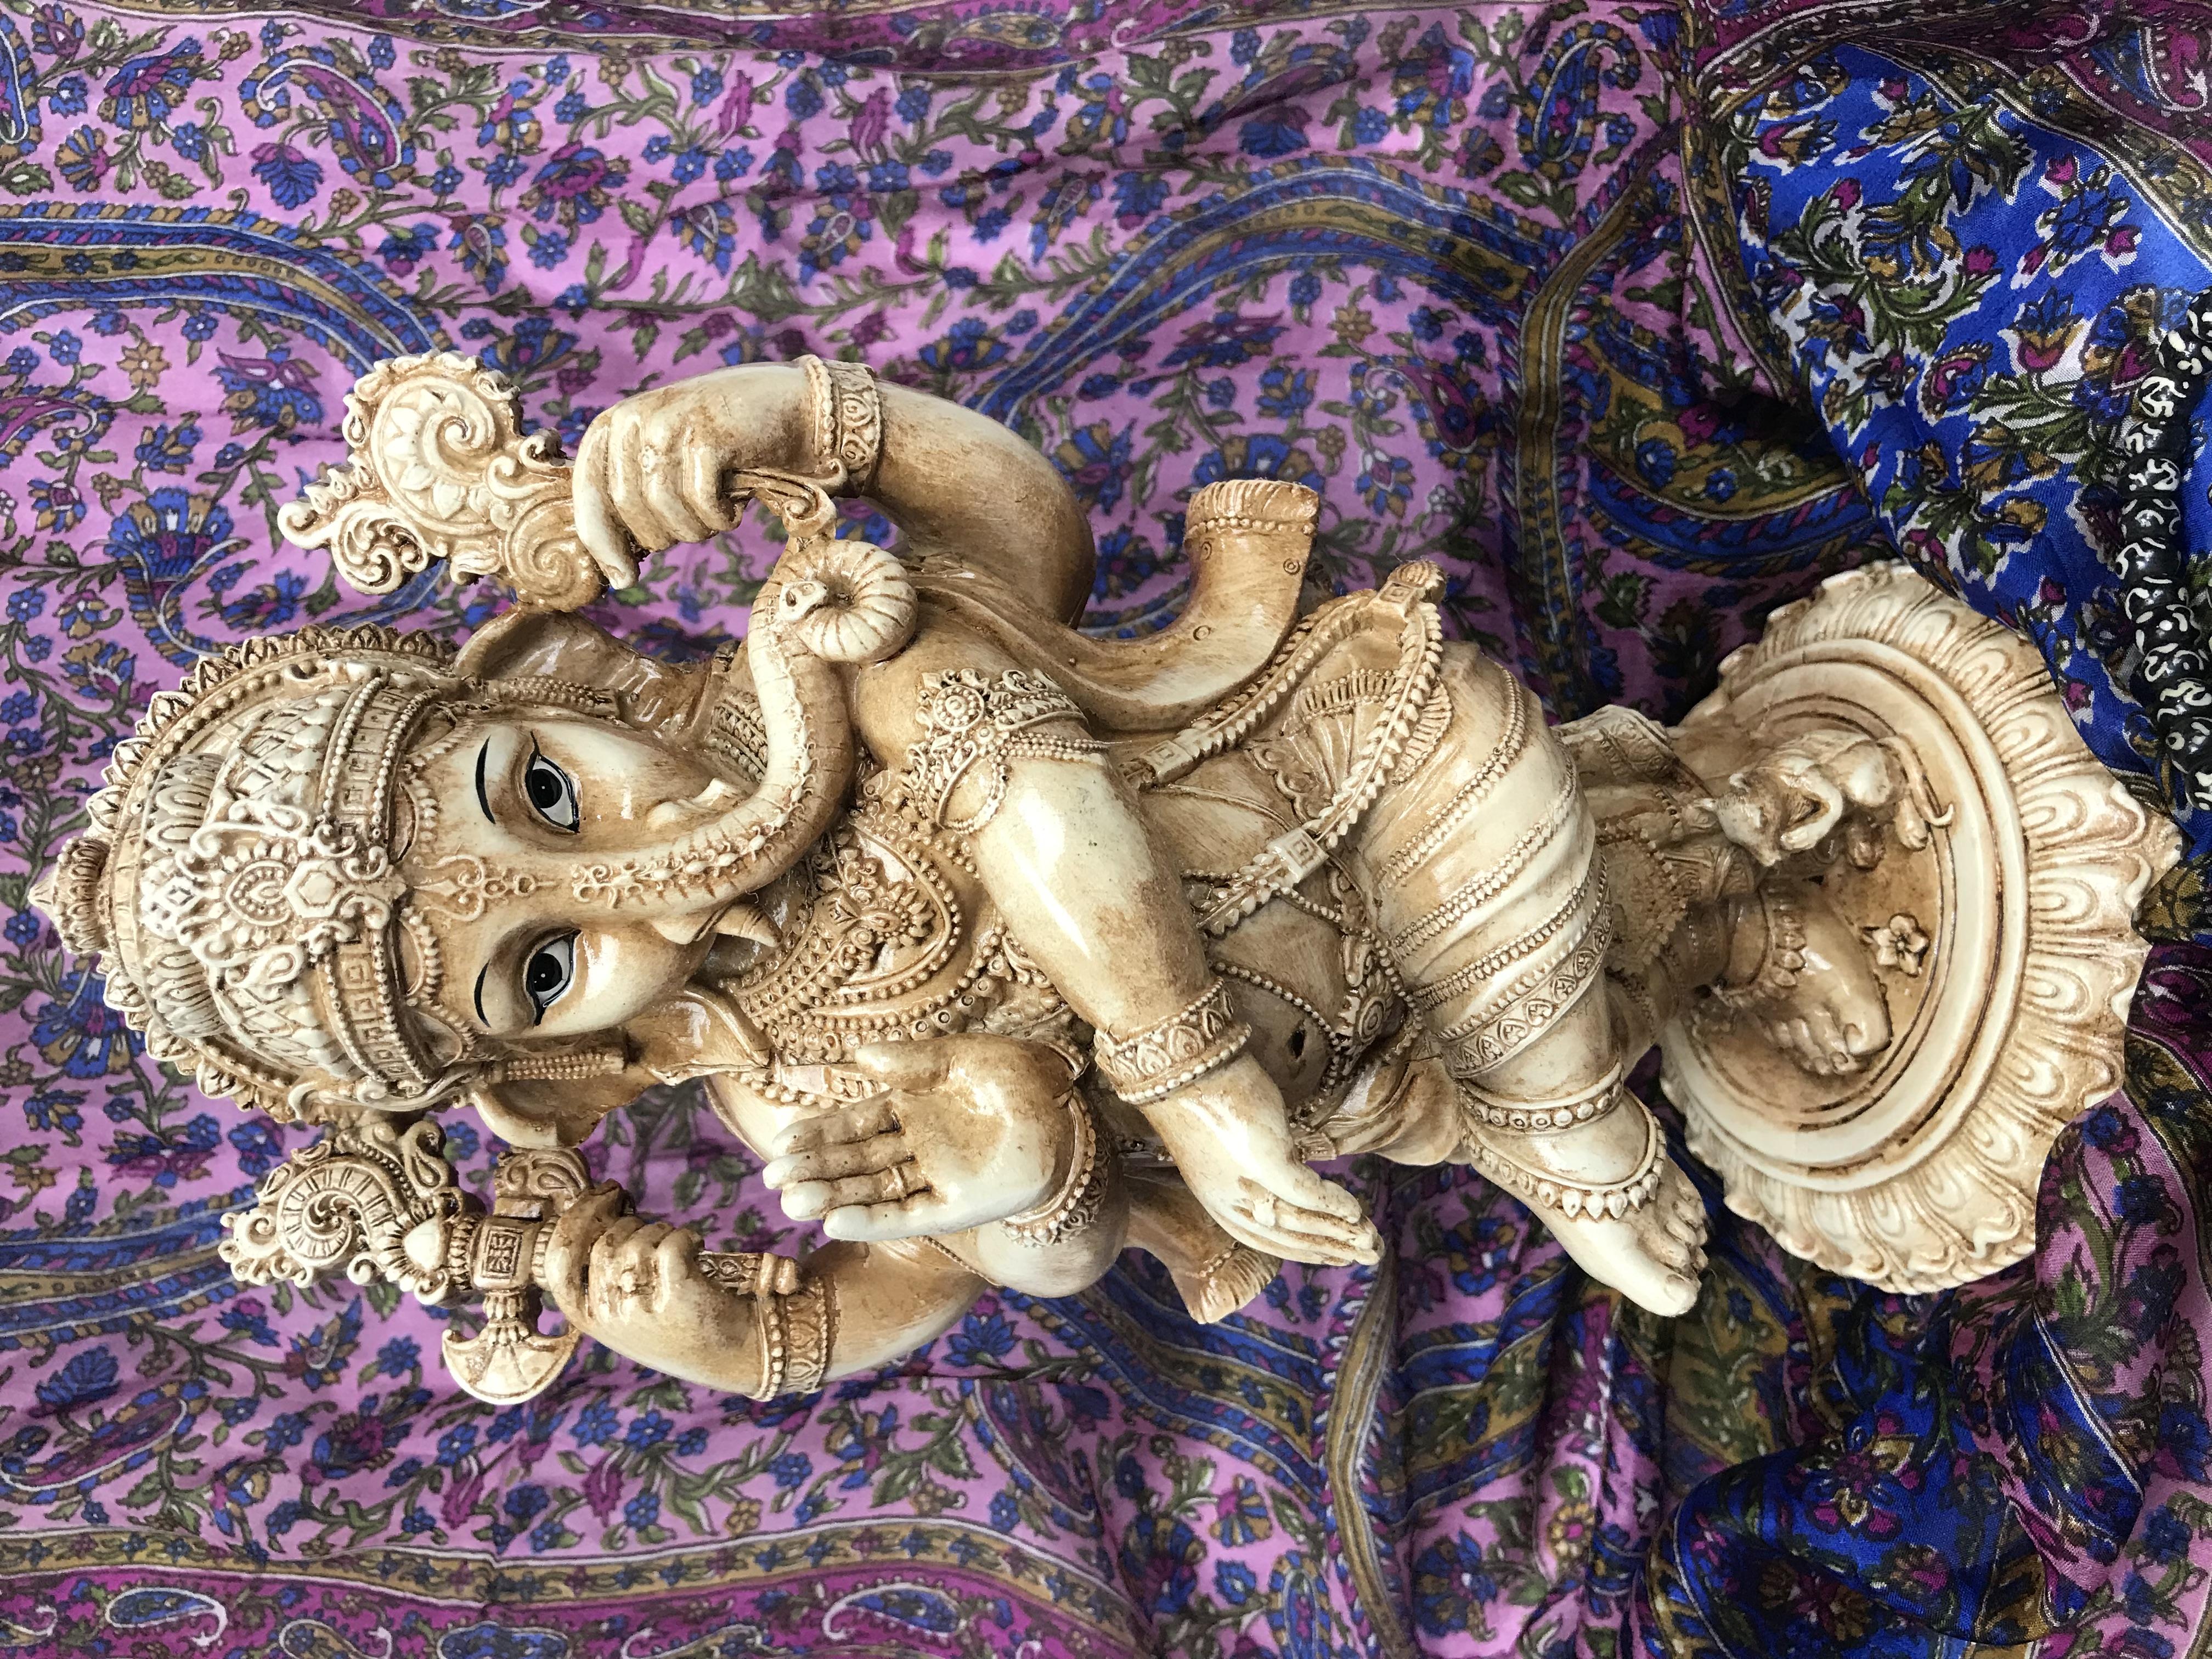 The story of Ganesha